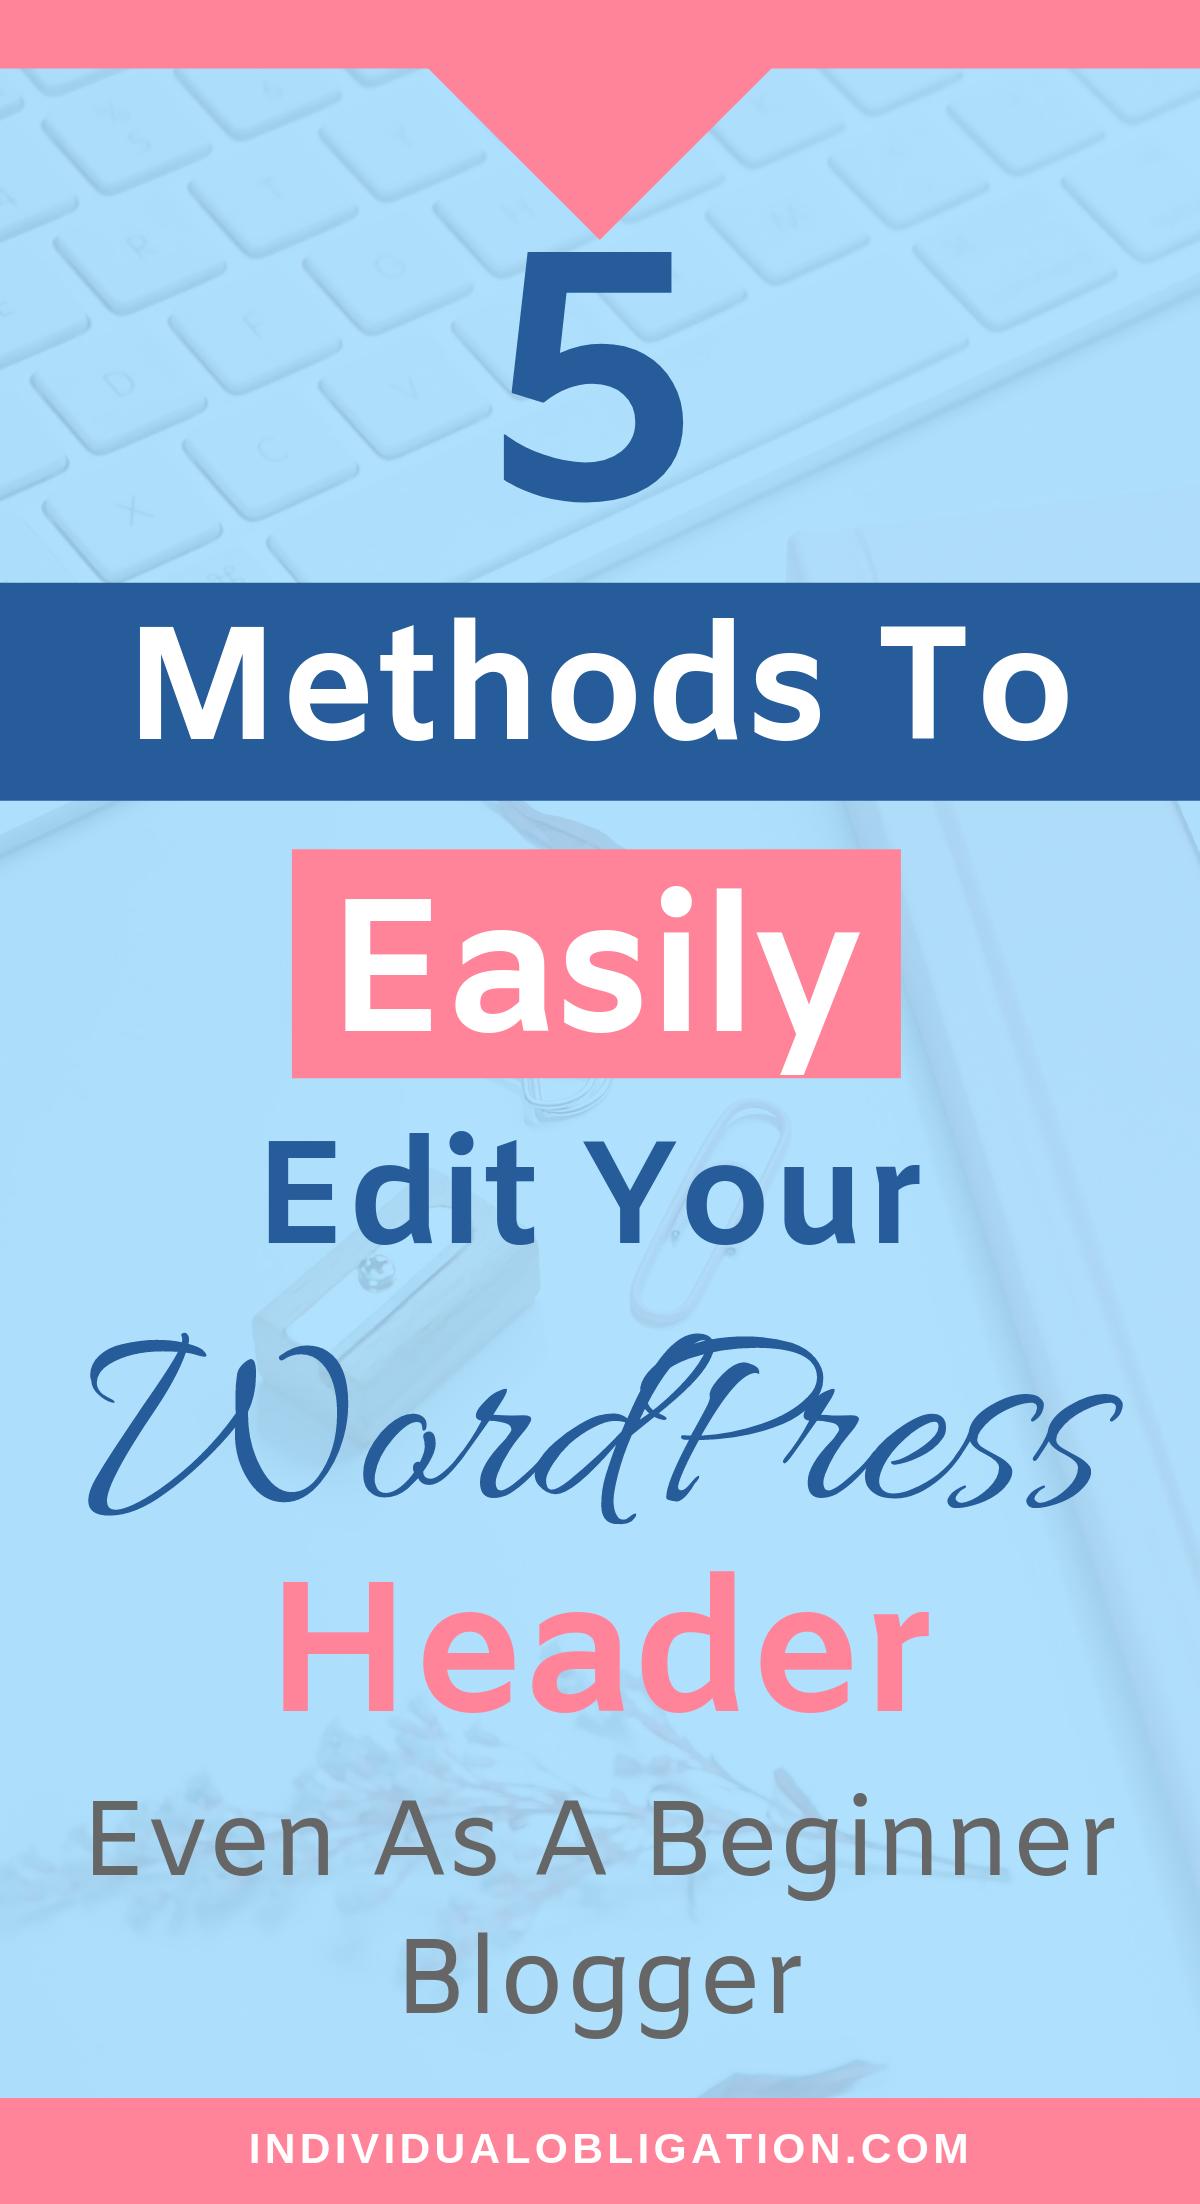 WordPress Header How to Edit Your Header Using 5